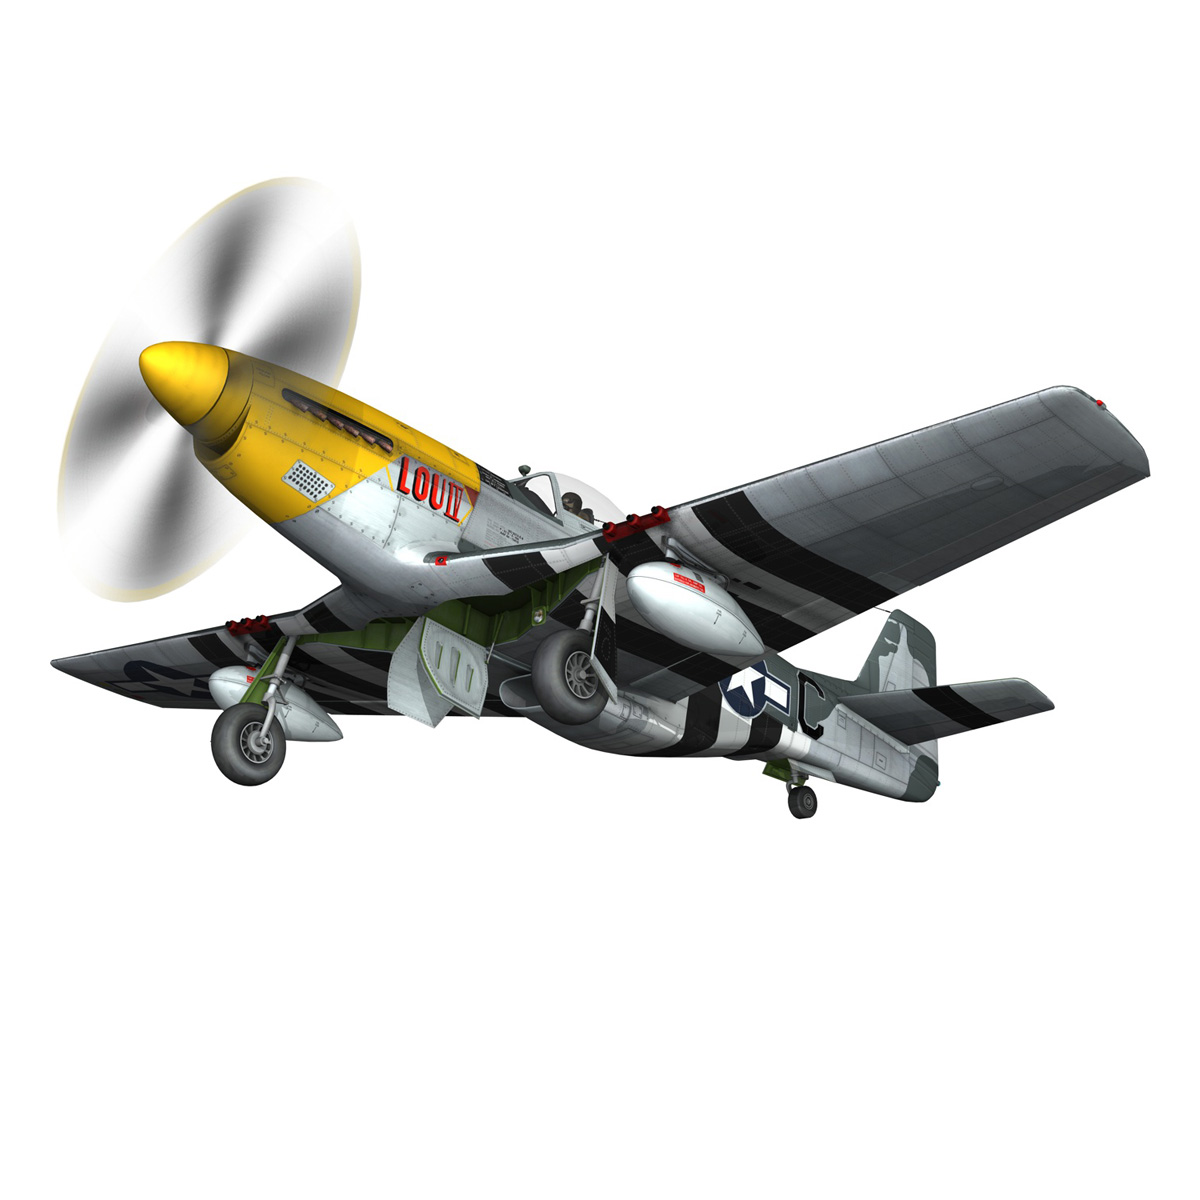 north american p-51d mustang – lou iv 3d model fbx c4d lwo obj 272606